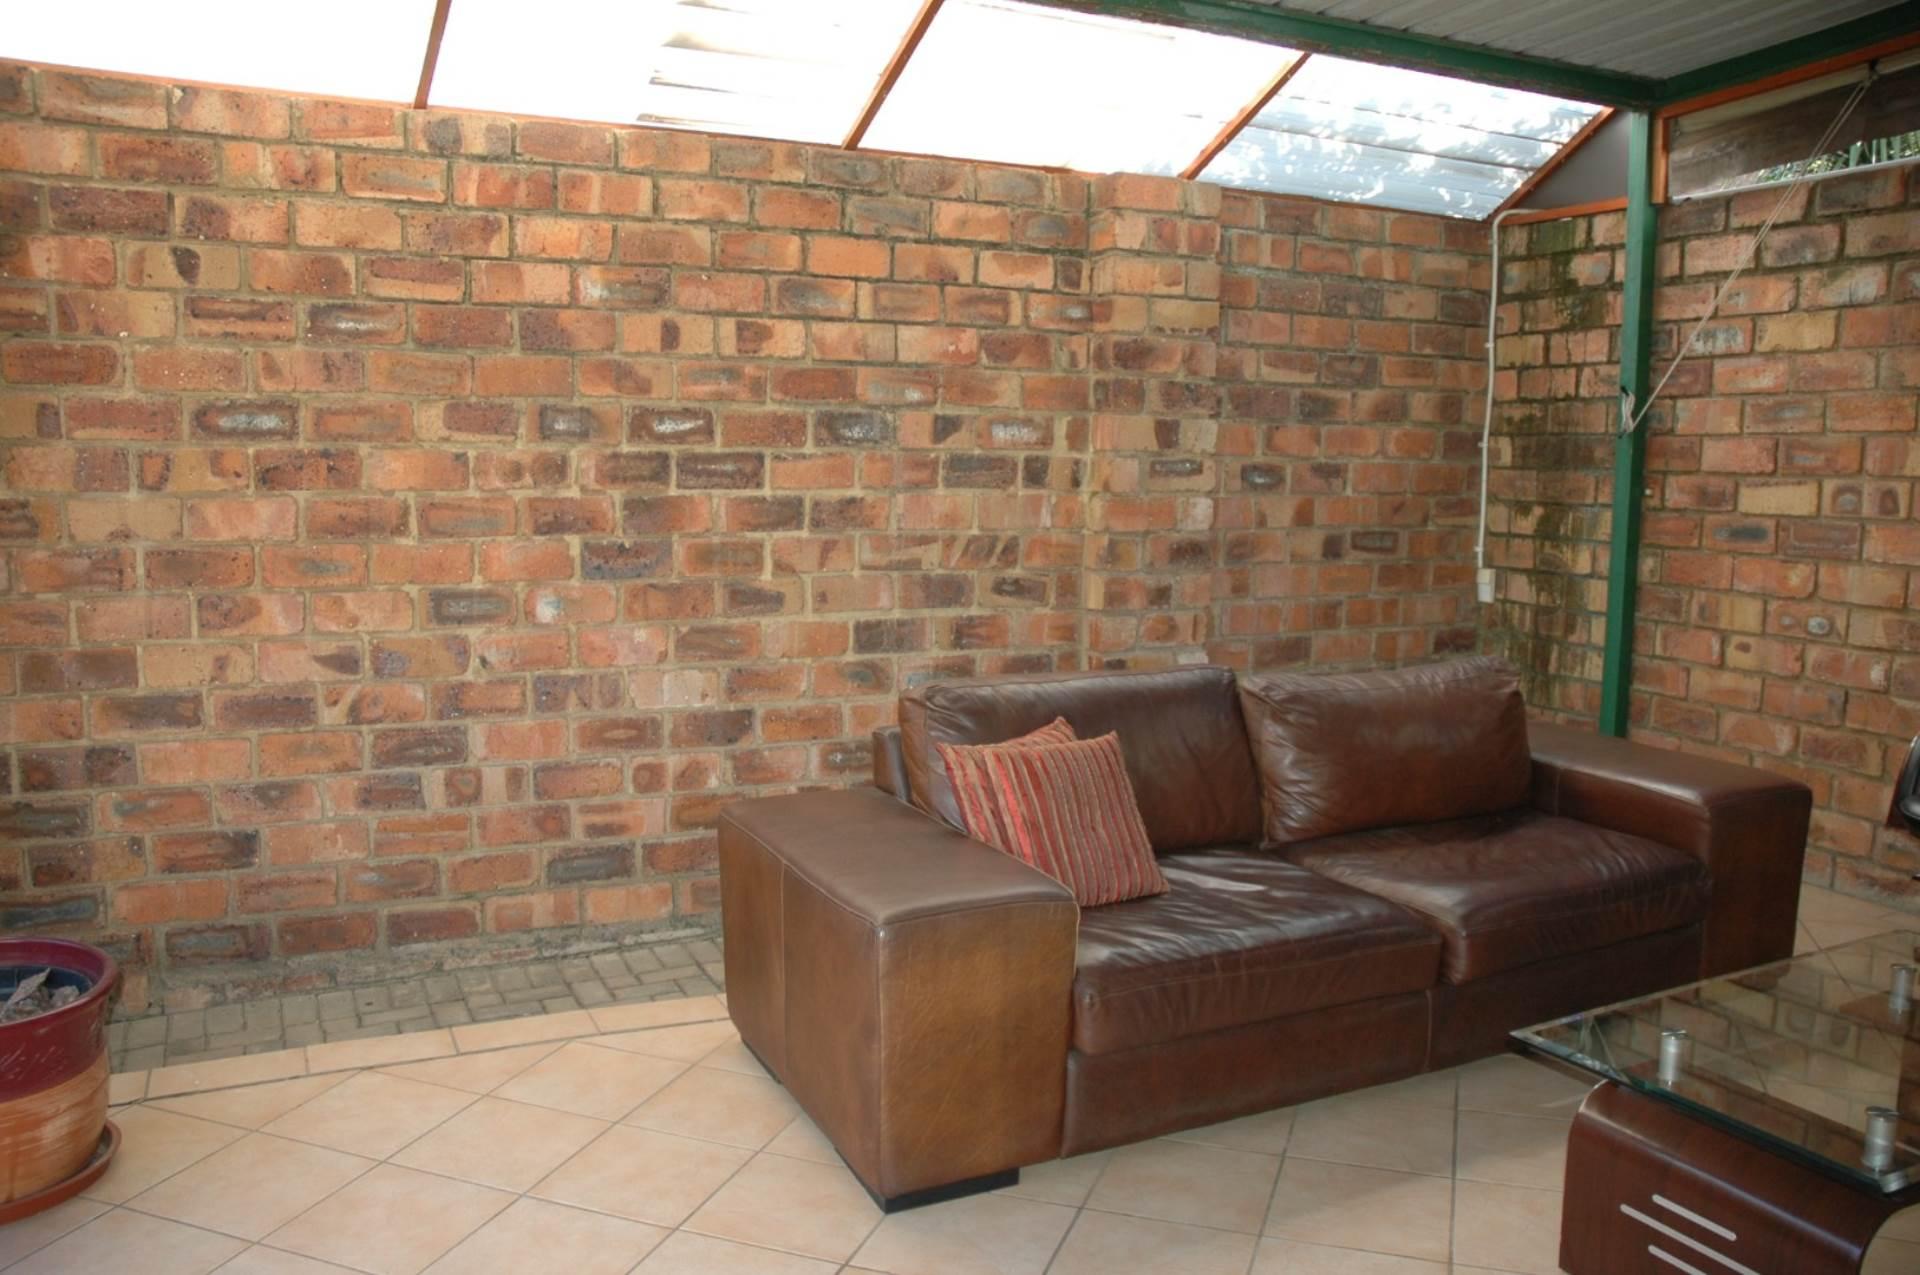 Townhouse Pending Sale In Wapadrand, Pretoria, Gauteng for R 1,200,000